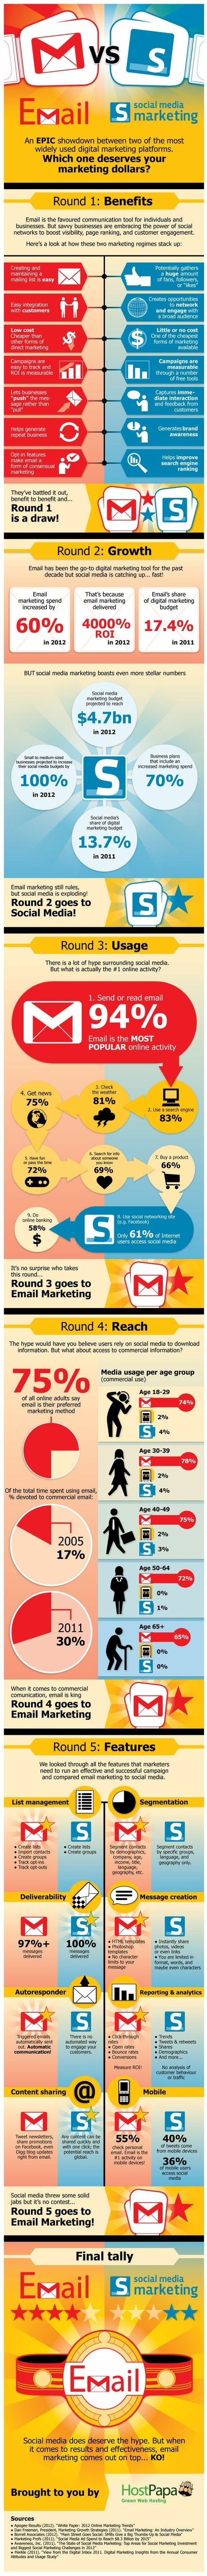 Email Marketing vs Social Media Marketing [infographic] | Marketing on social platforms | Scoop.it